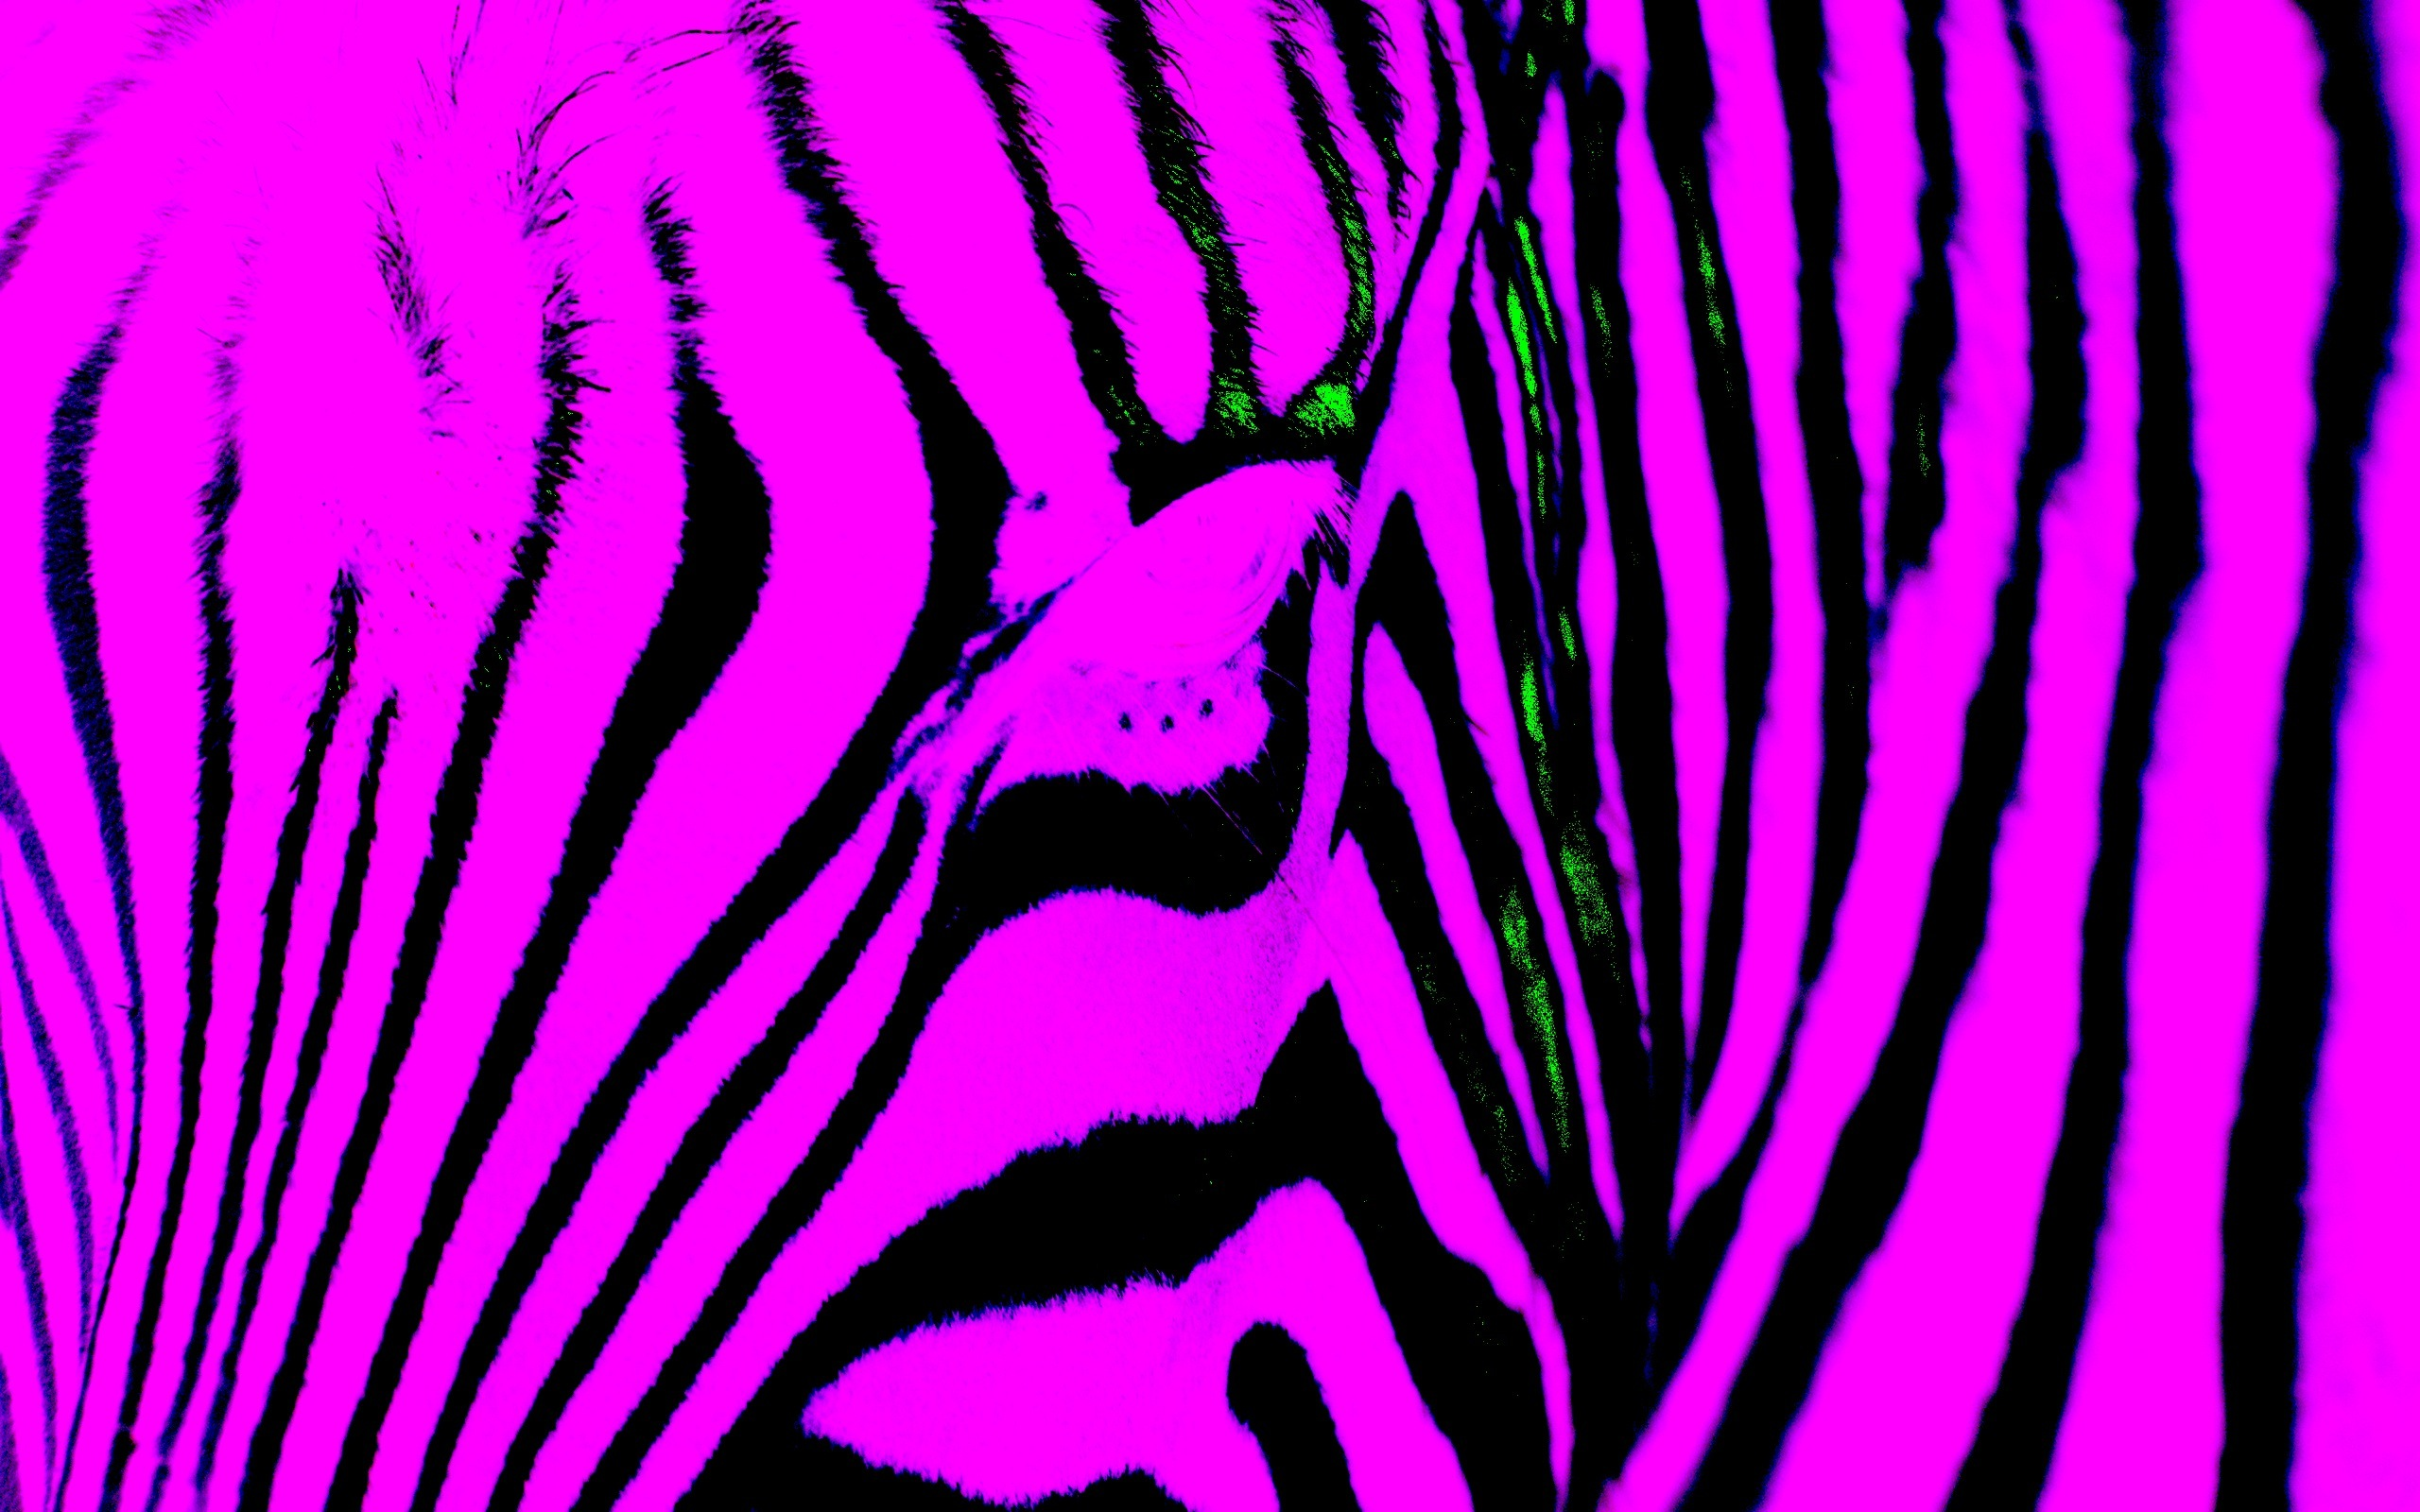 Zebra Peace Sign Backgrounds Zebra Print Peace Sign 2560x1600